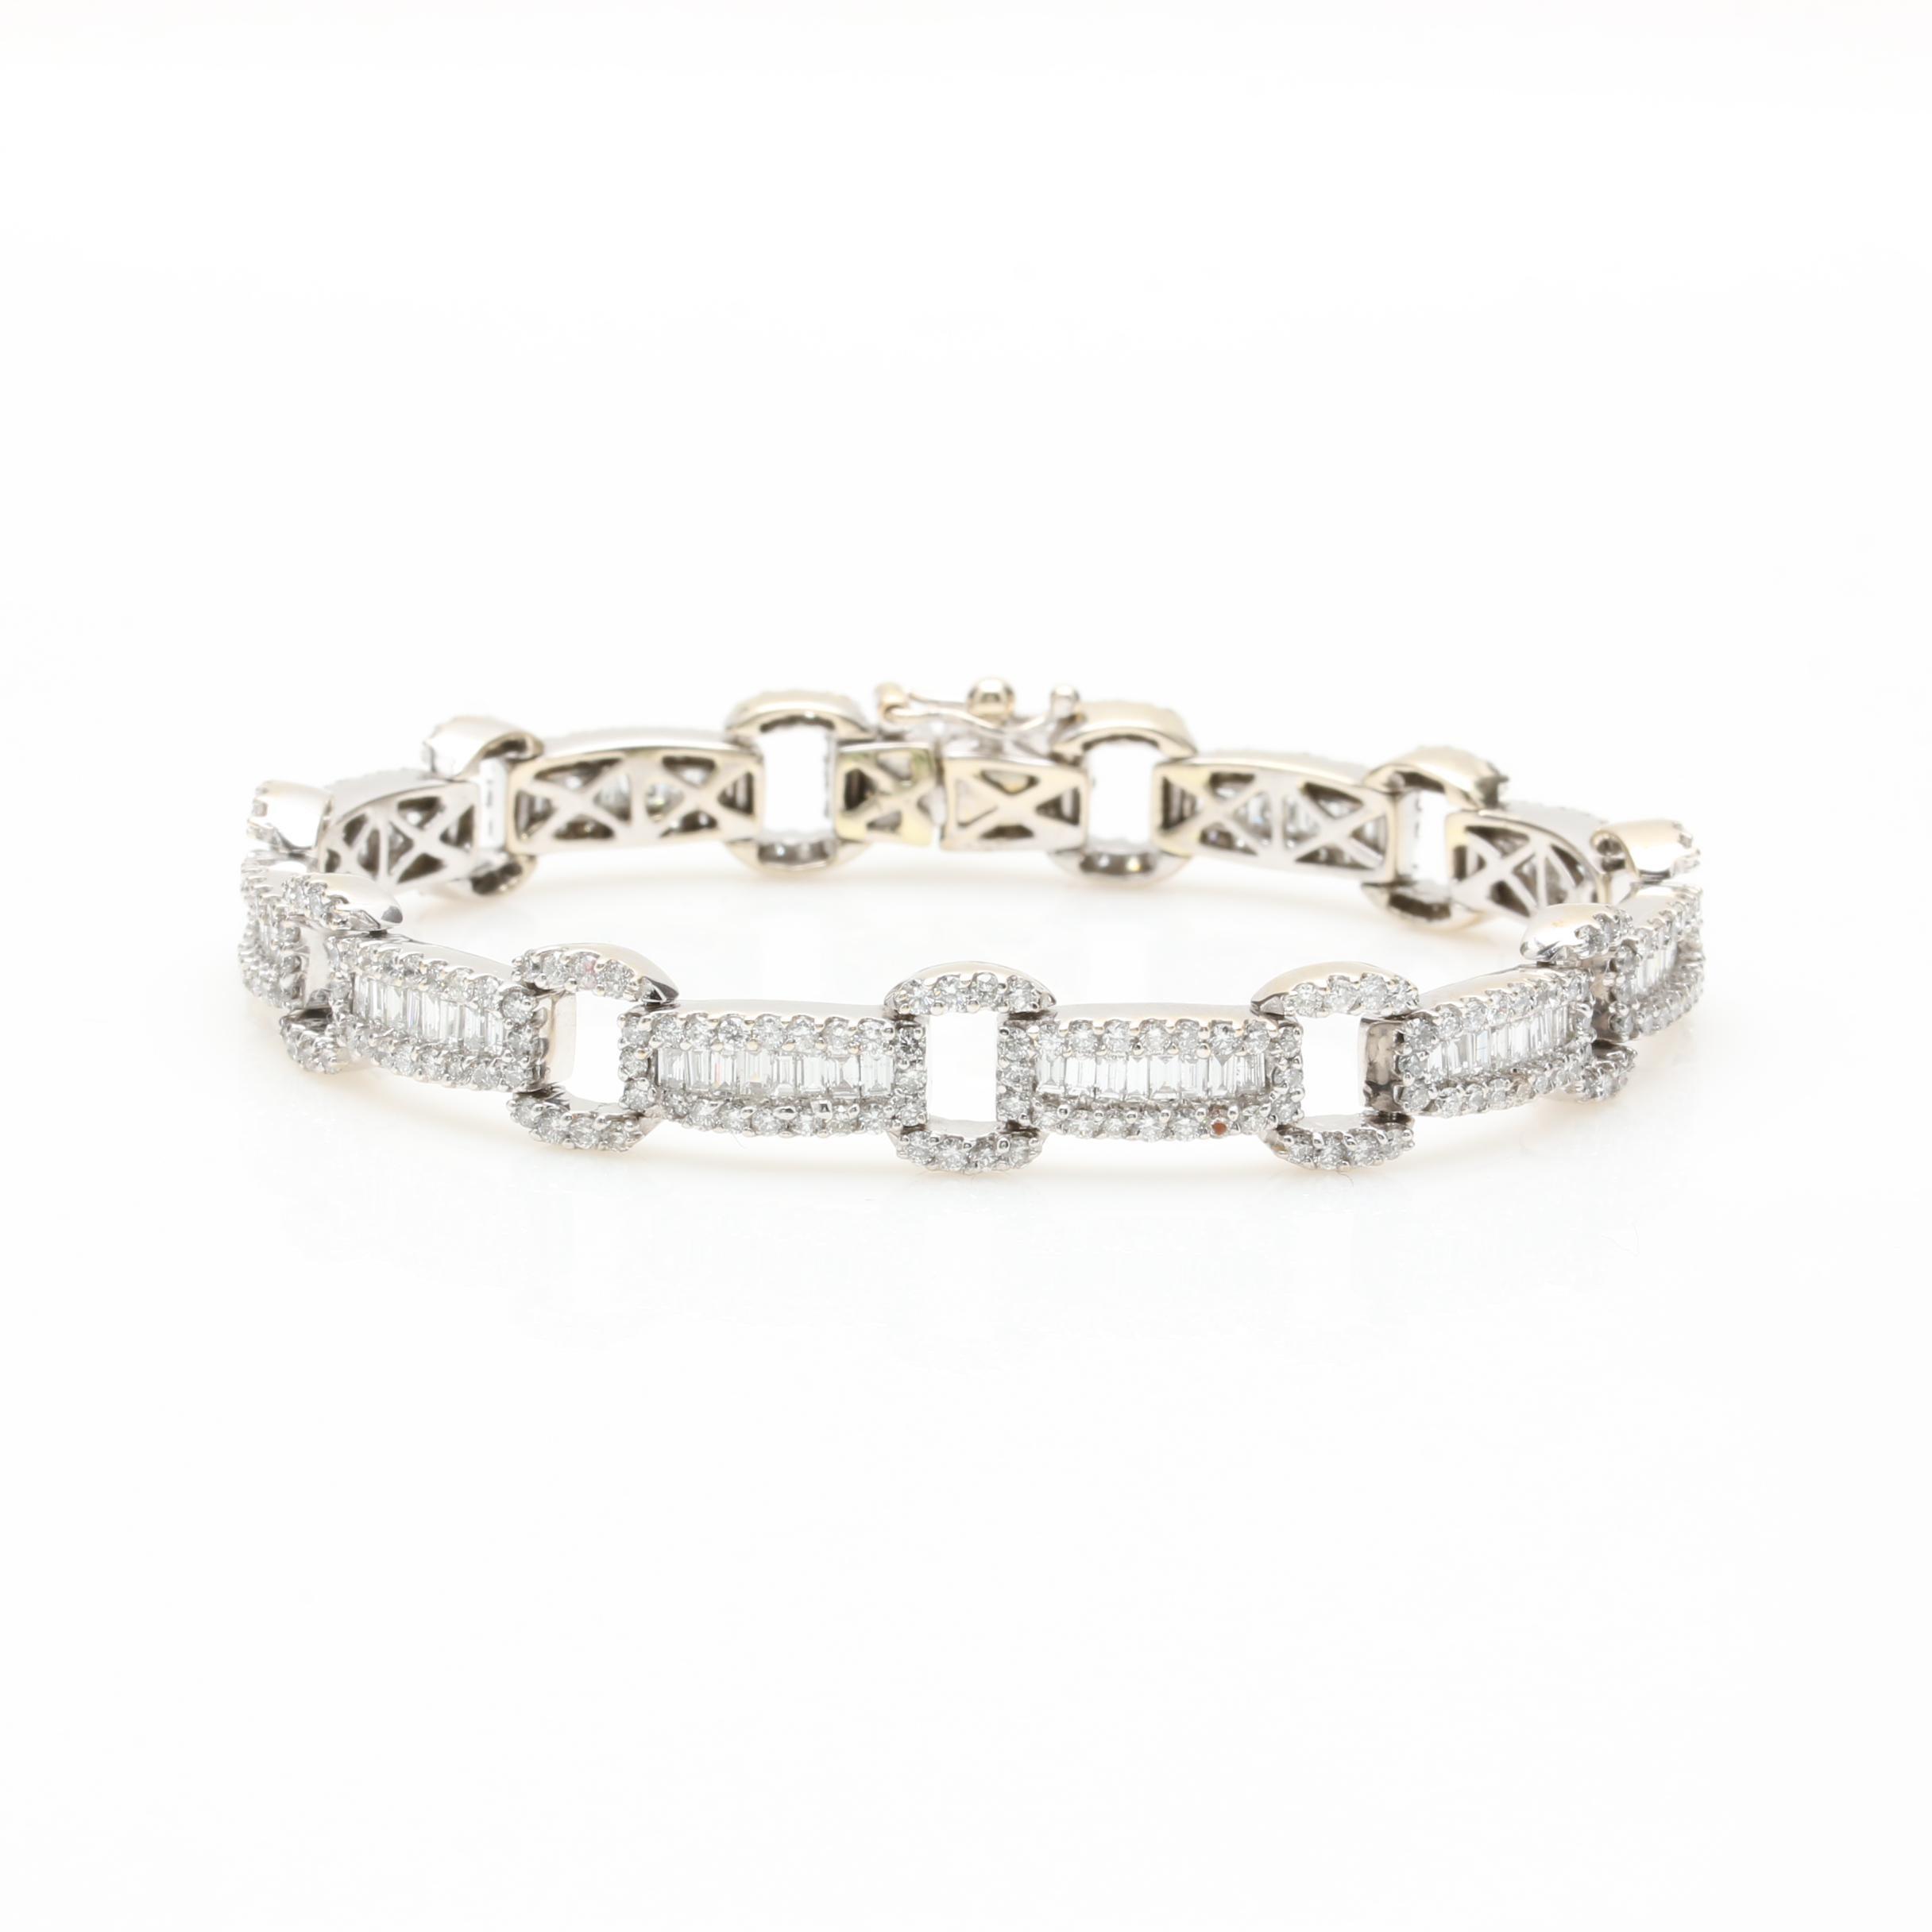 14K White Gold 5.03 CTW Diamond Bracelet